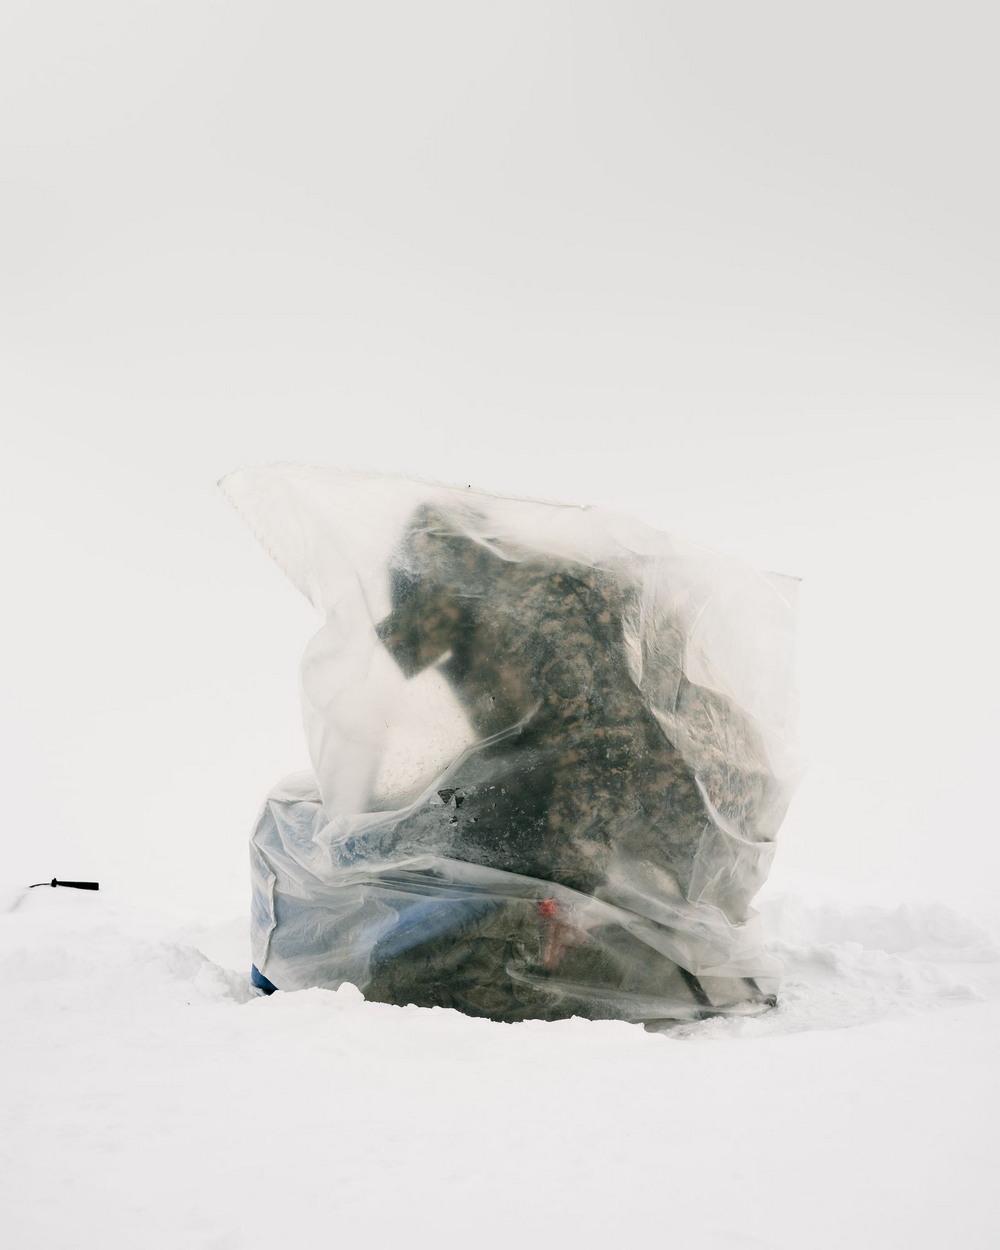 Казахи на зимней рыбалке